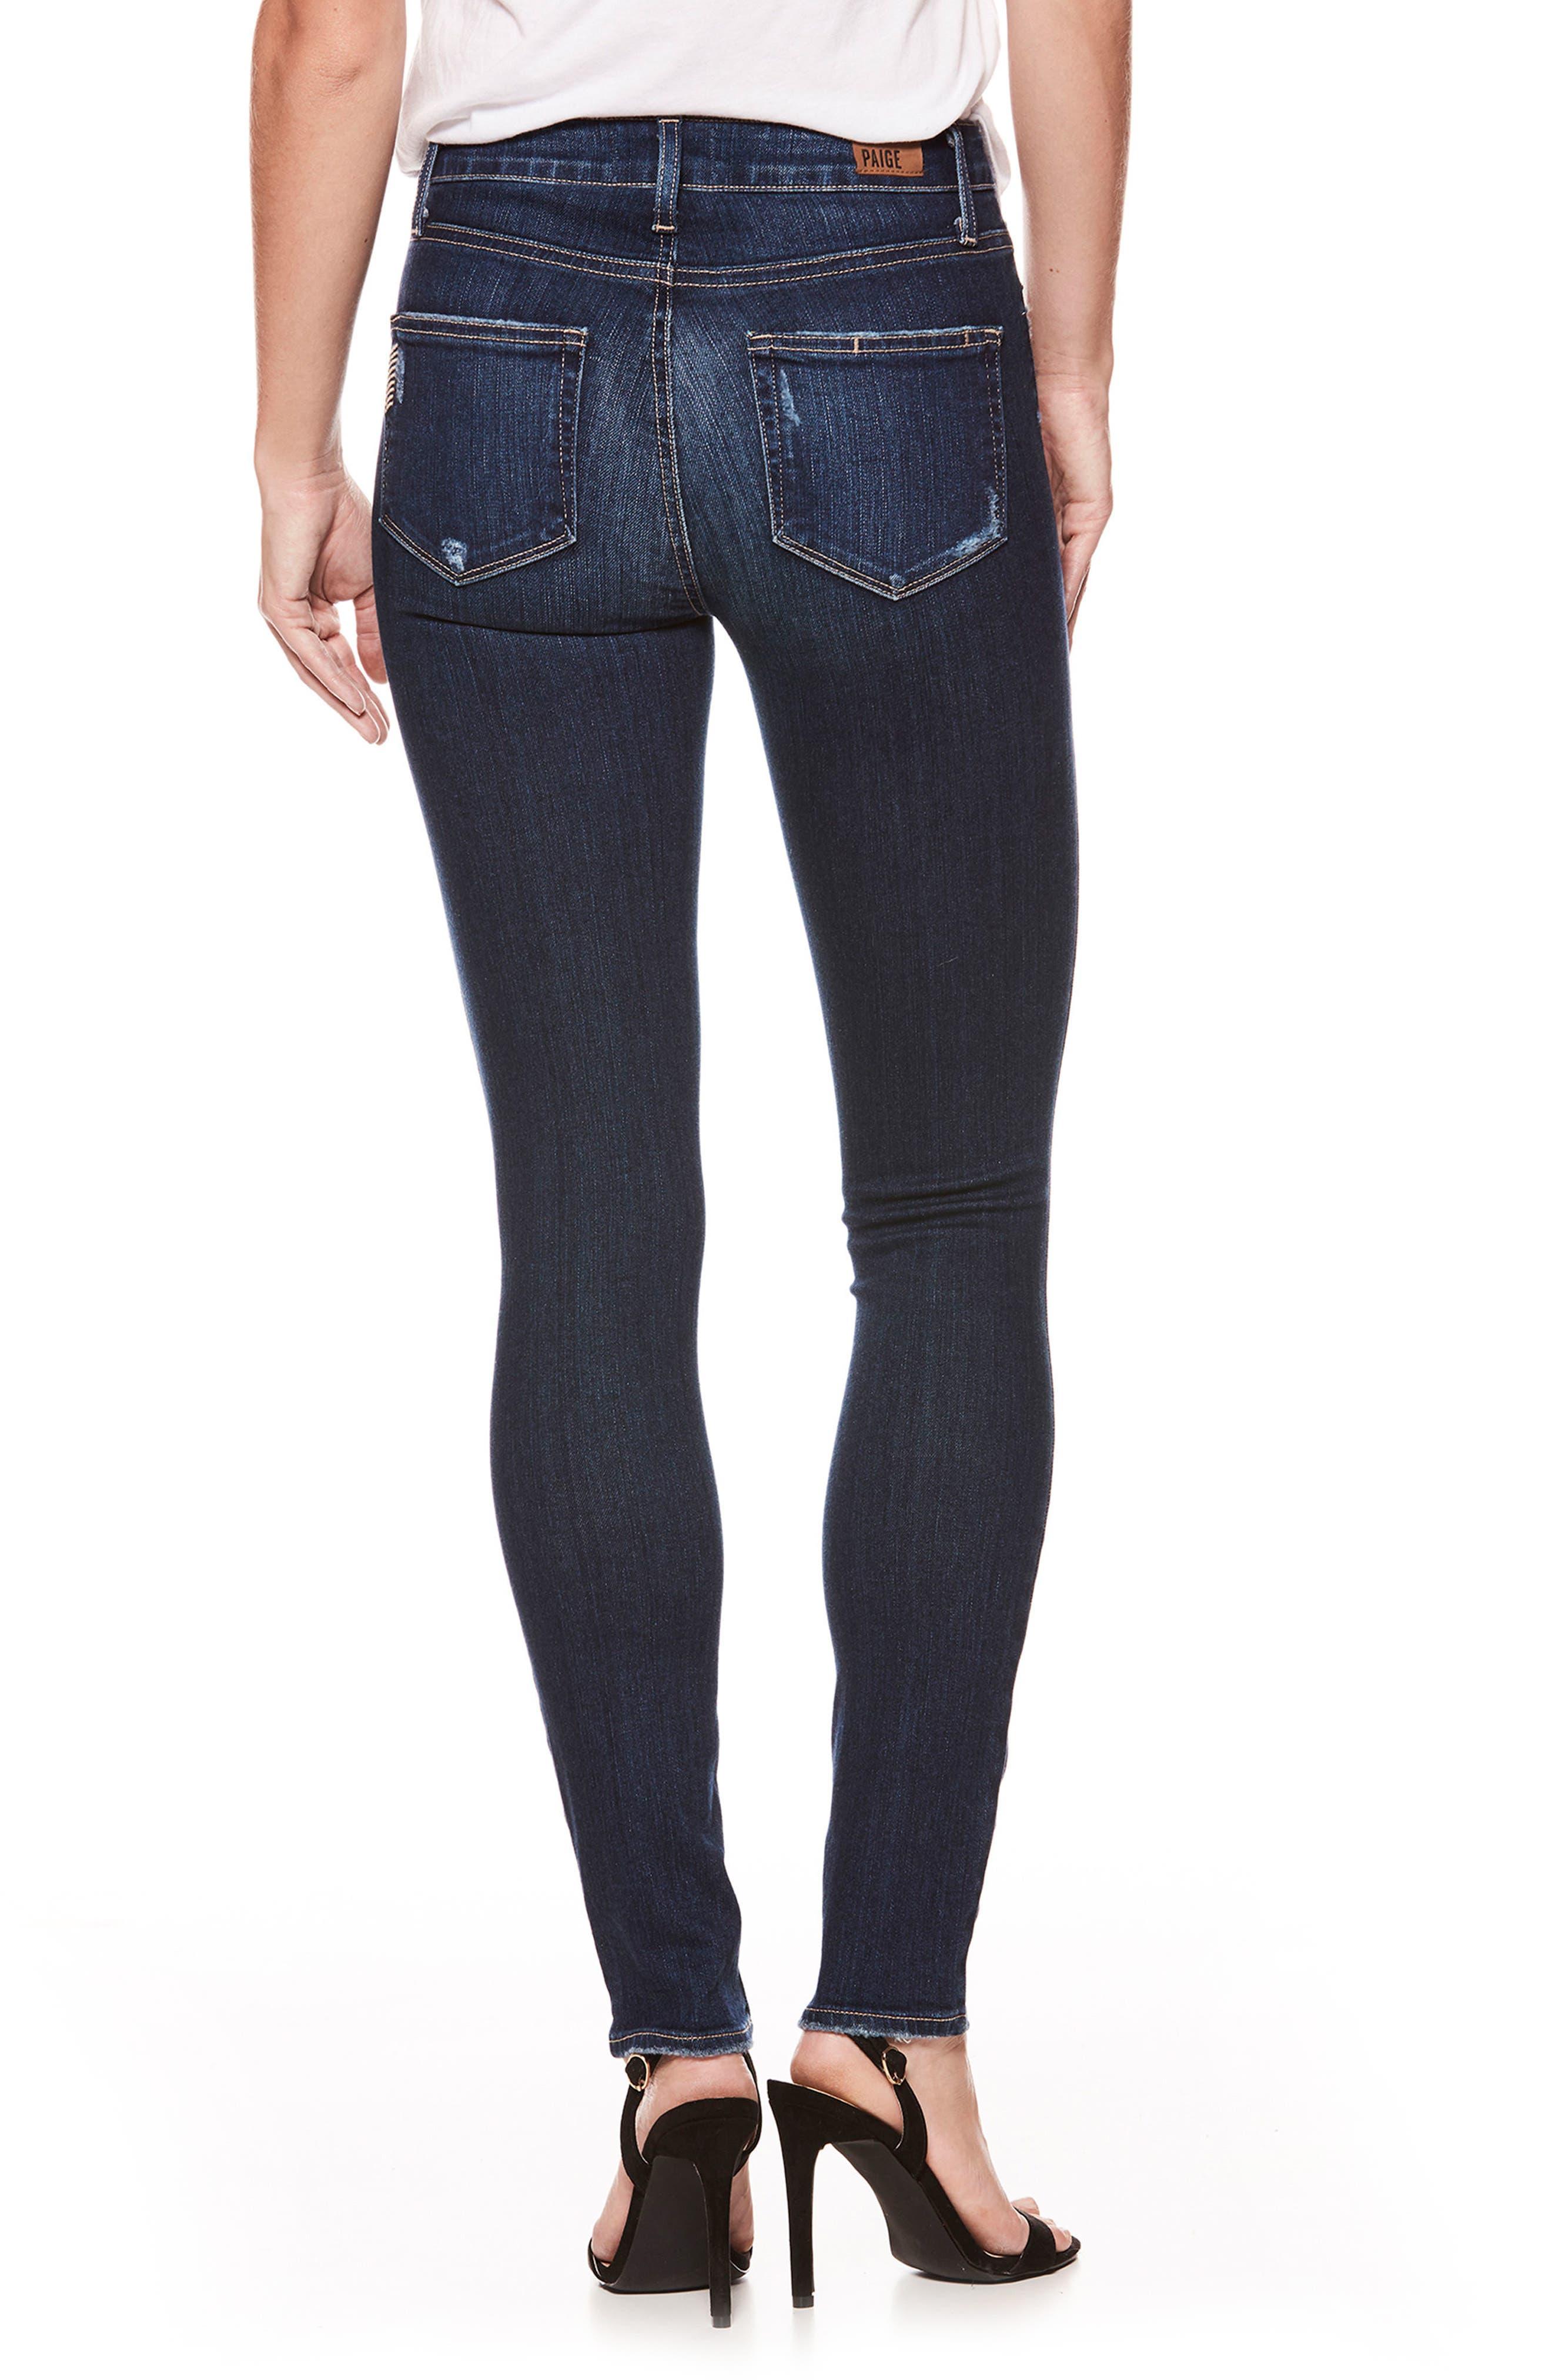 Hoxton High Waist Skinny Jeans,                             Alternate thumbnail 2, color,                             Marina